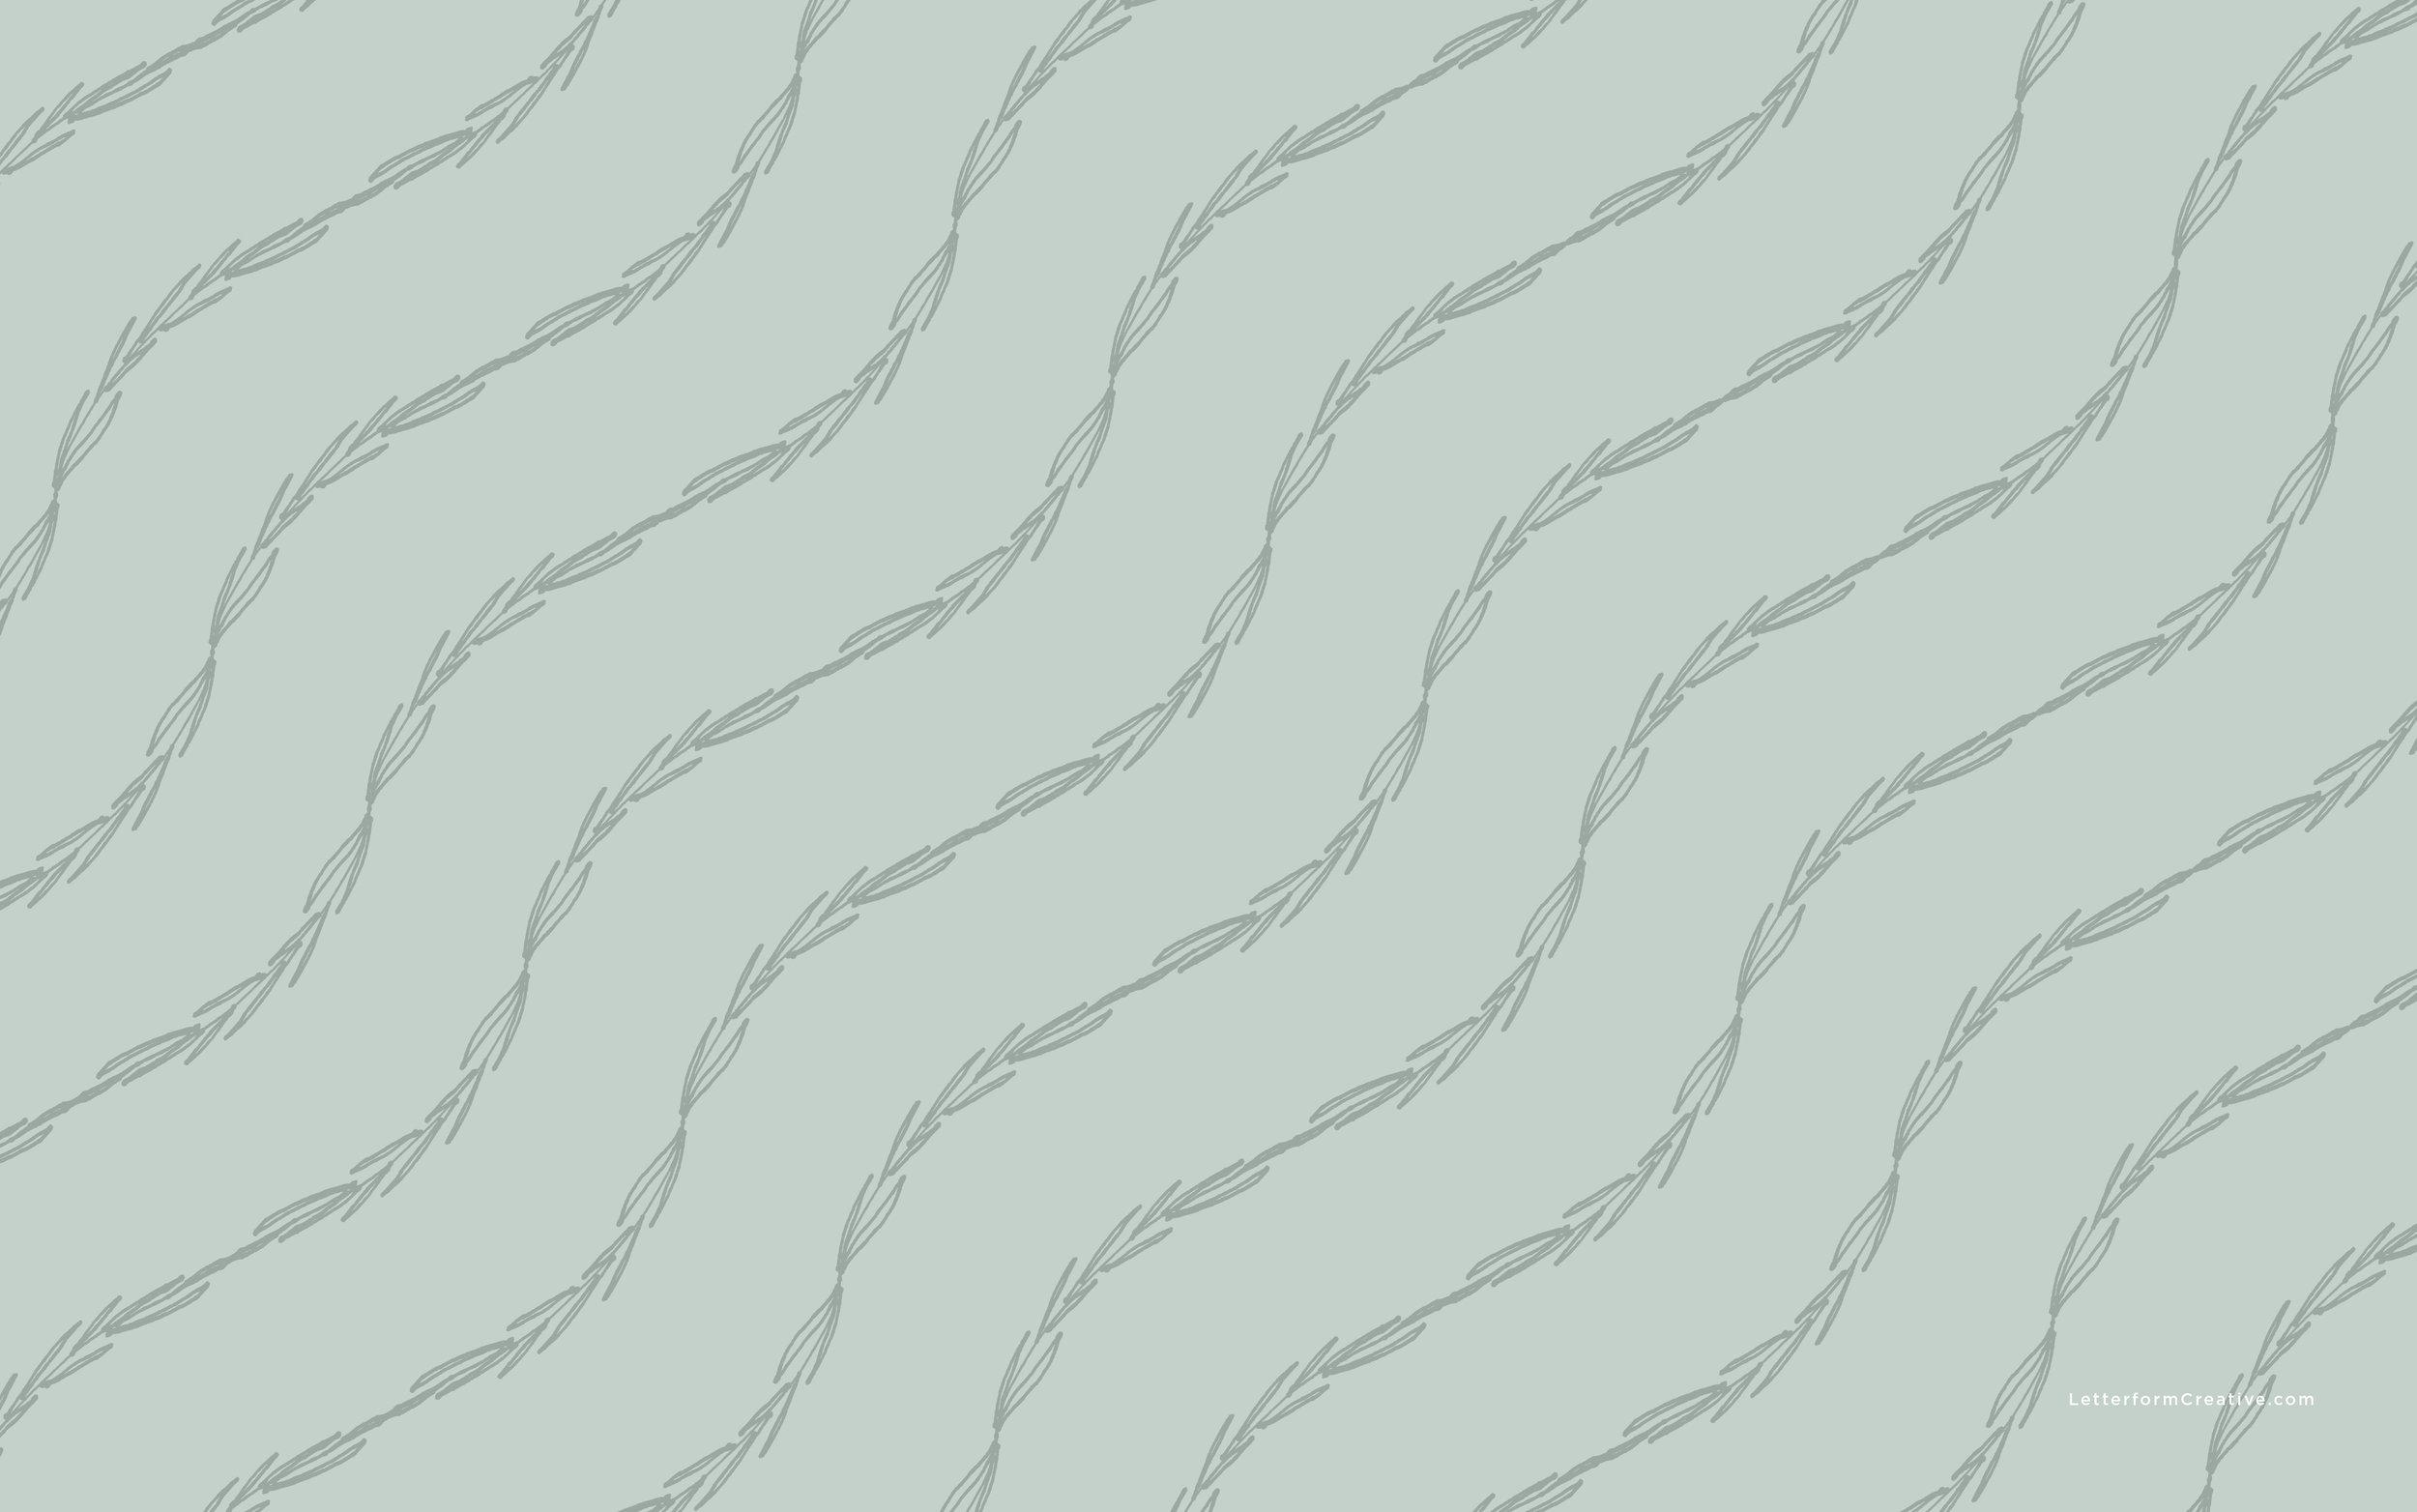 Wavy Wallpaper / Letterform Creative